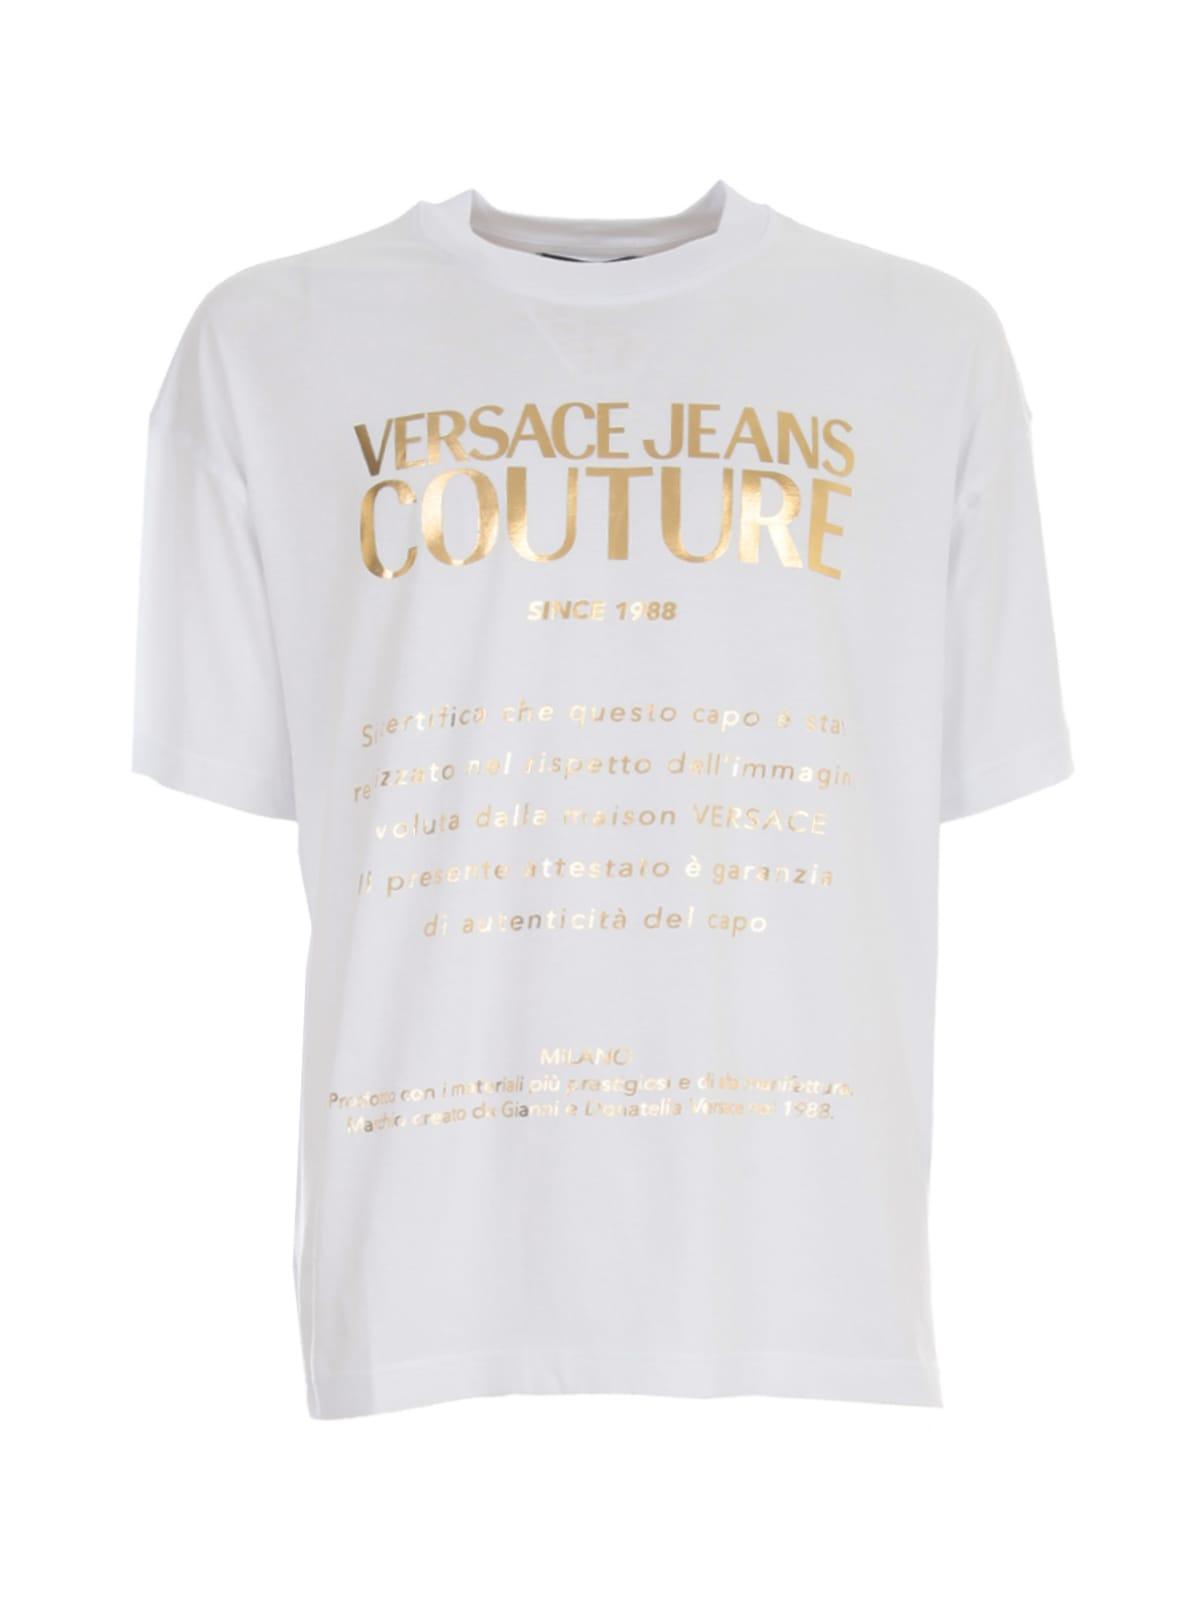 Versace Jeans Couture Over Gazanzia Foil Jersey T-shirt